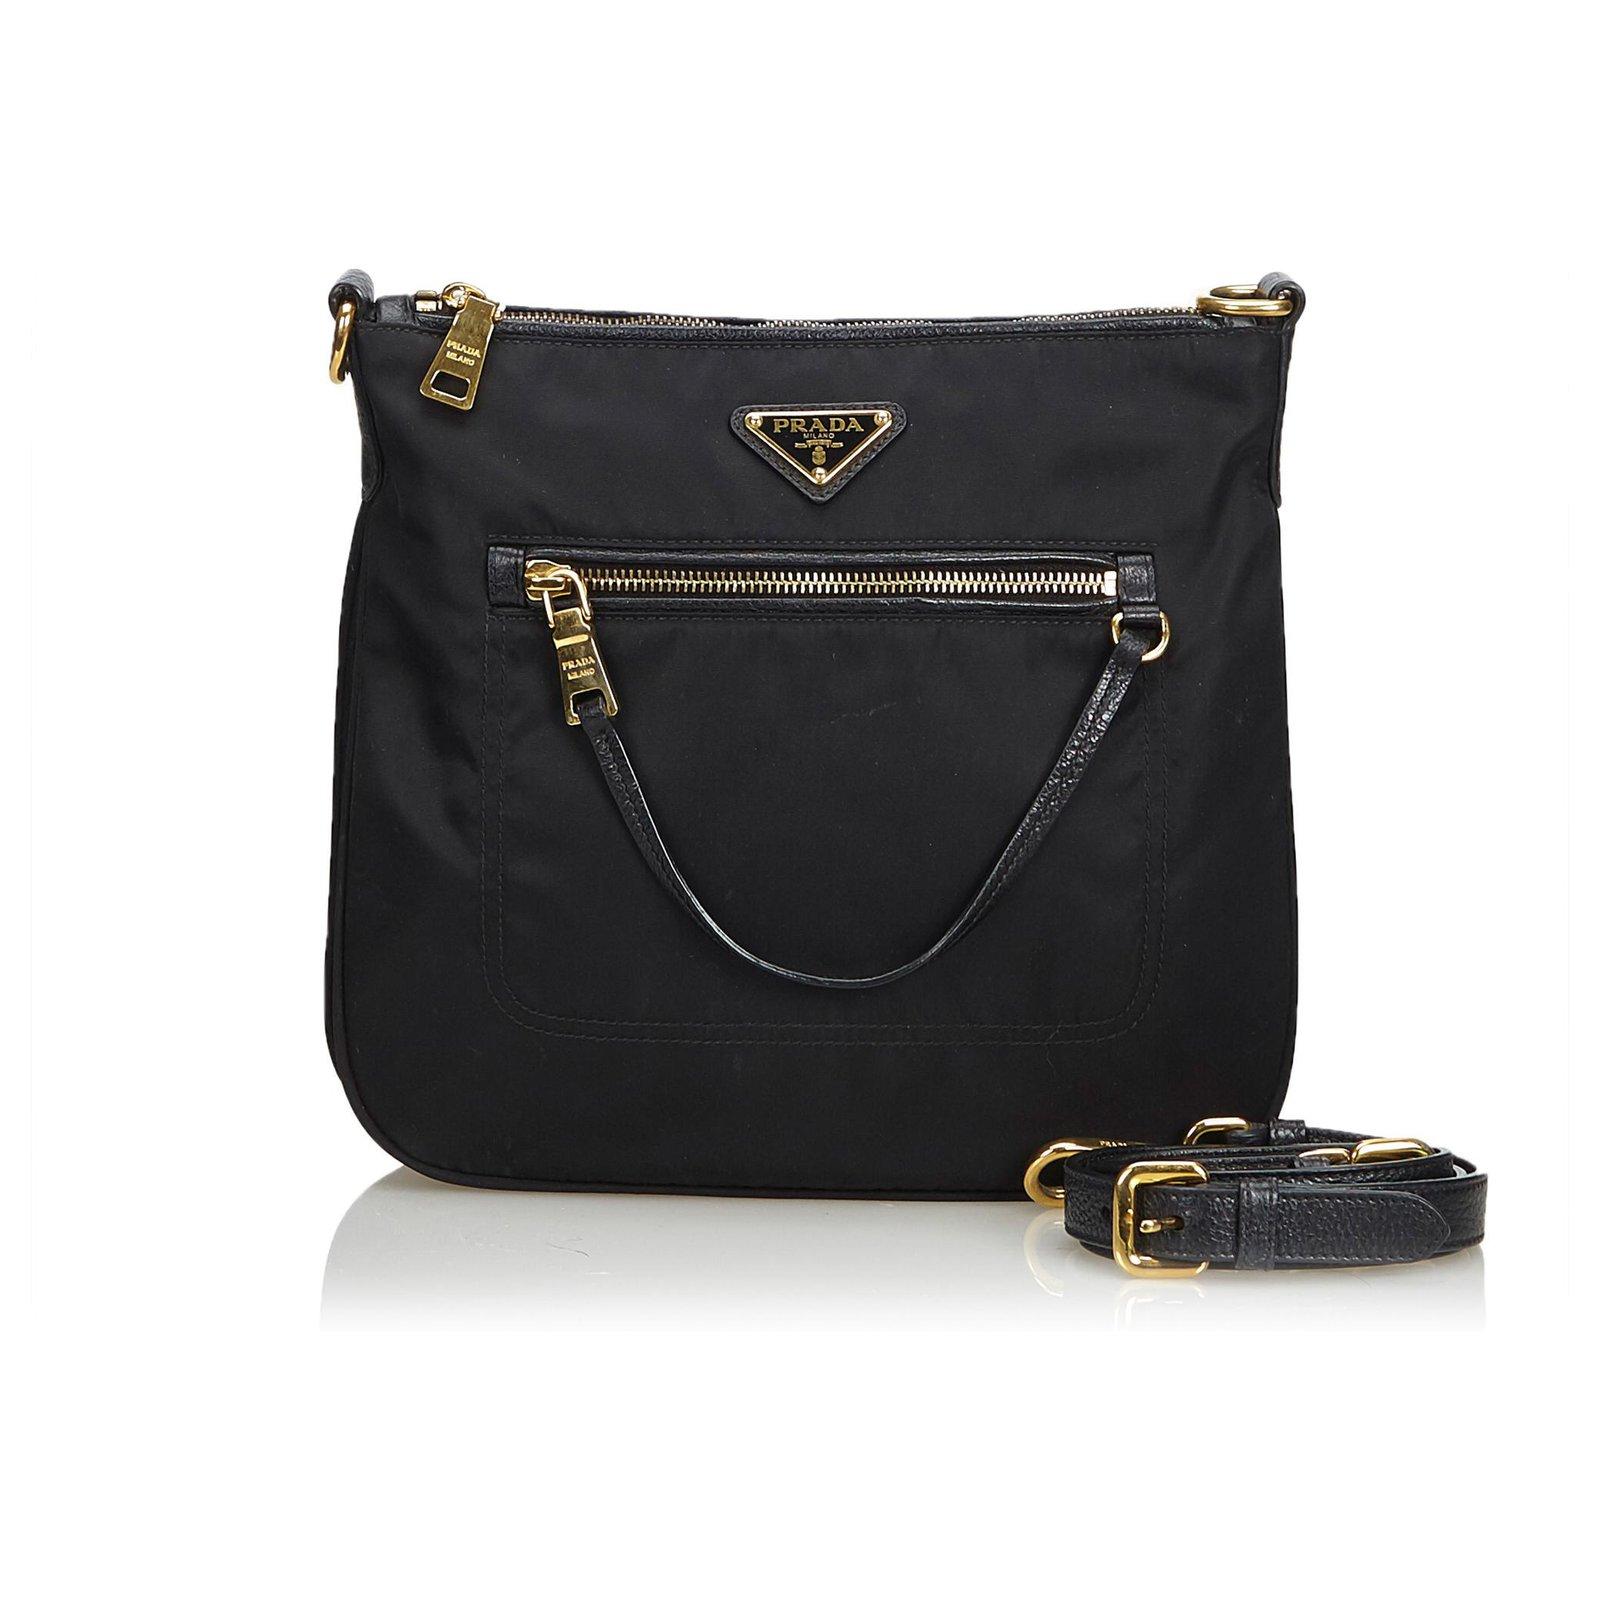 48a7445bb212 Prada Tessuto Nylon Shoulder Bag Handbags Leather,Other,Nylon,Cloth Black  ref.